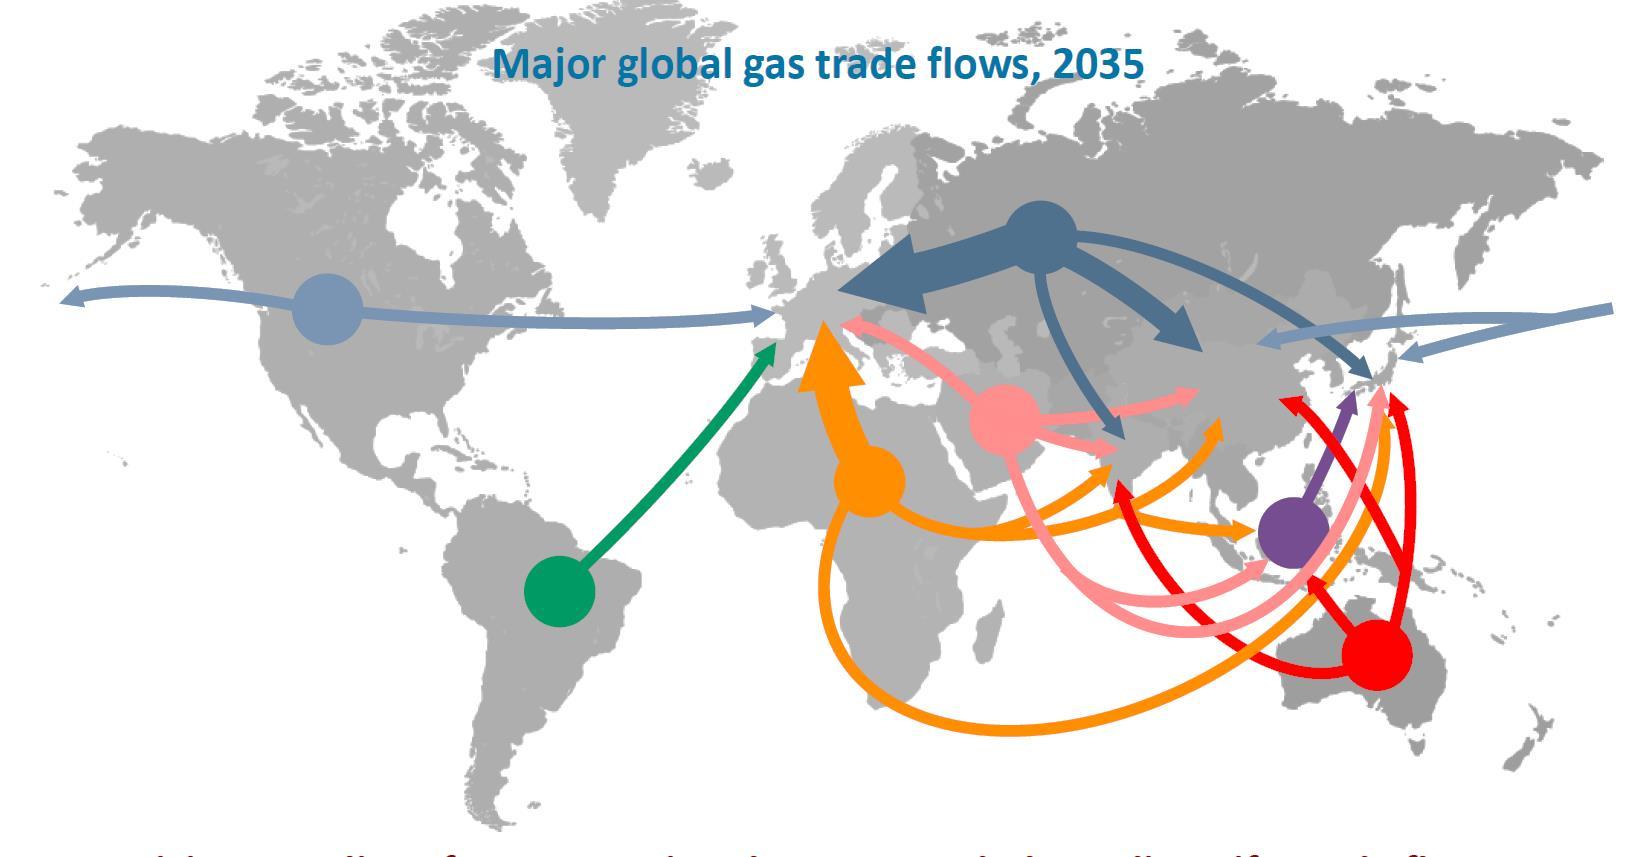 Major-global-gas-trade-flows